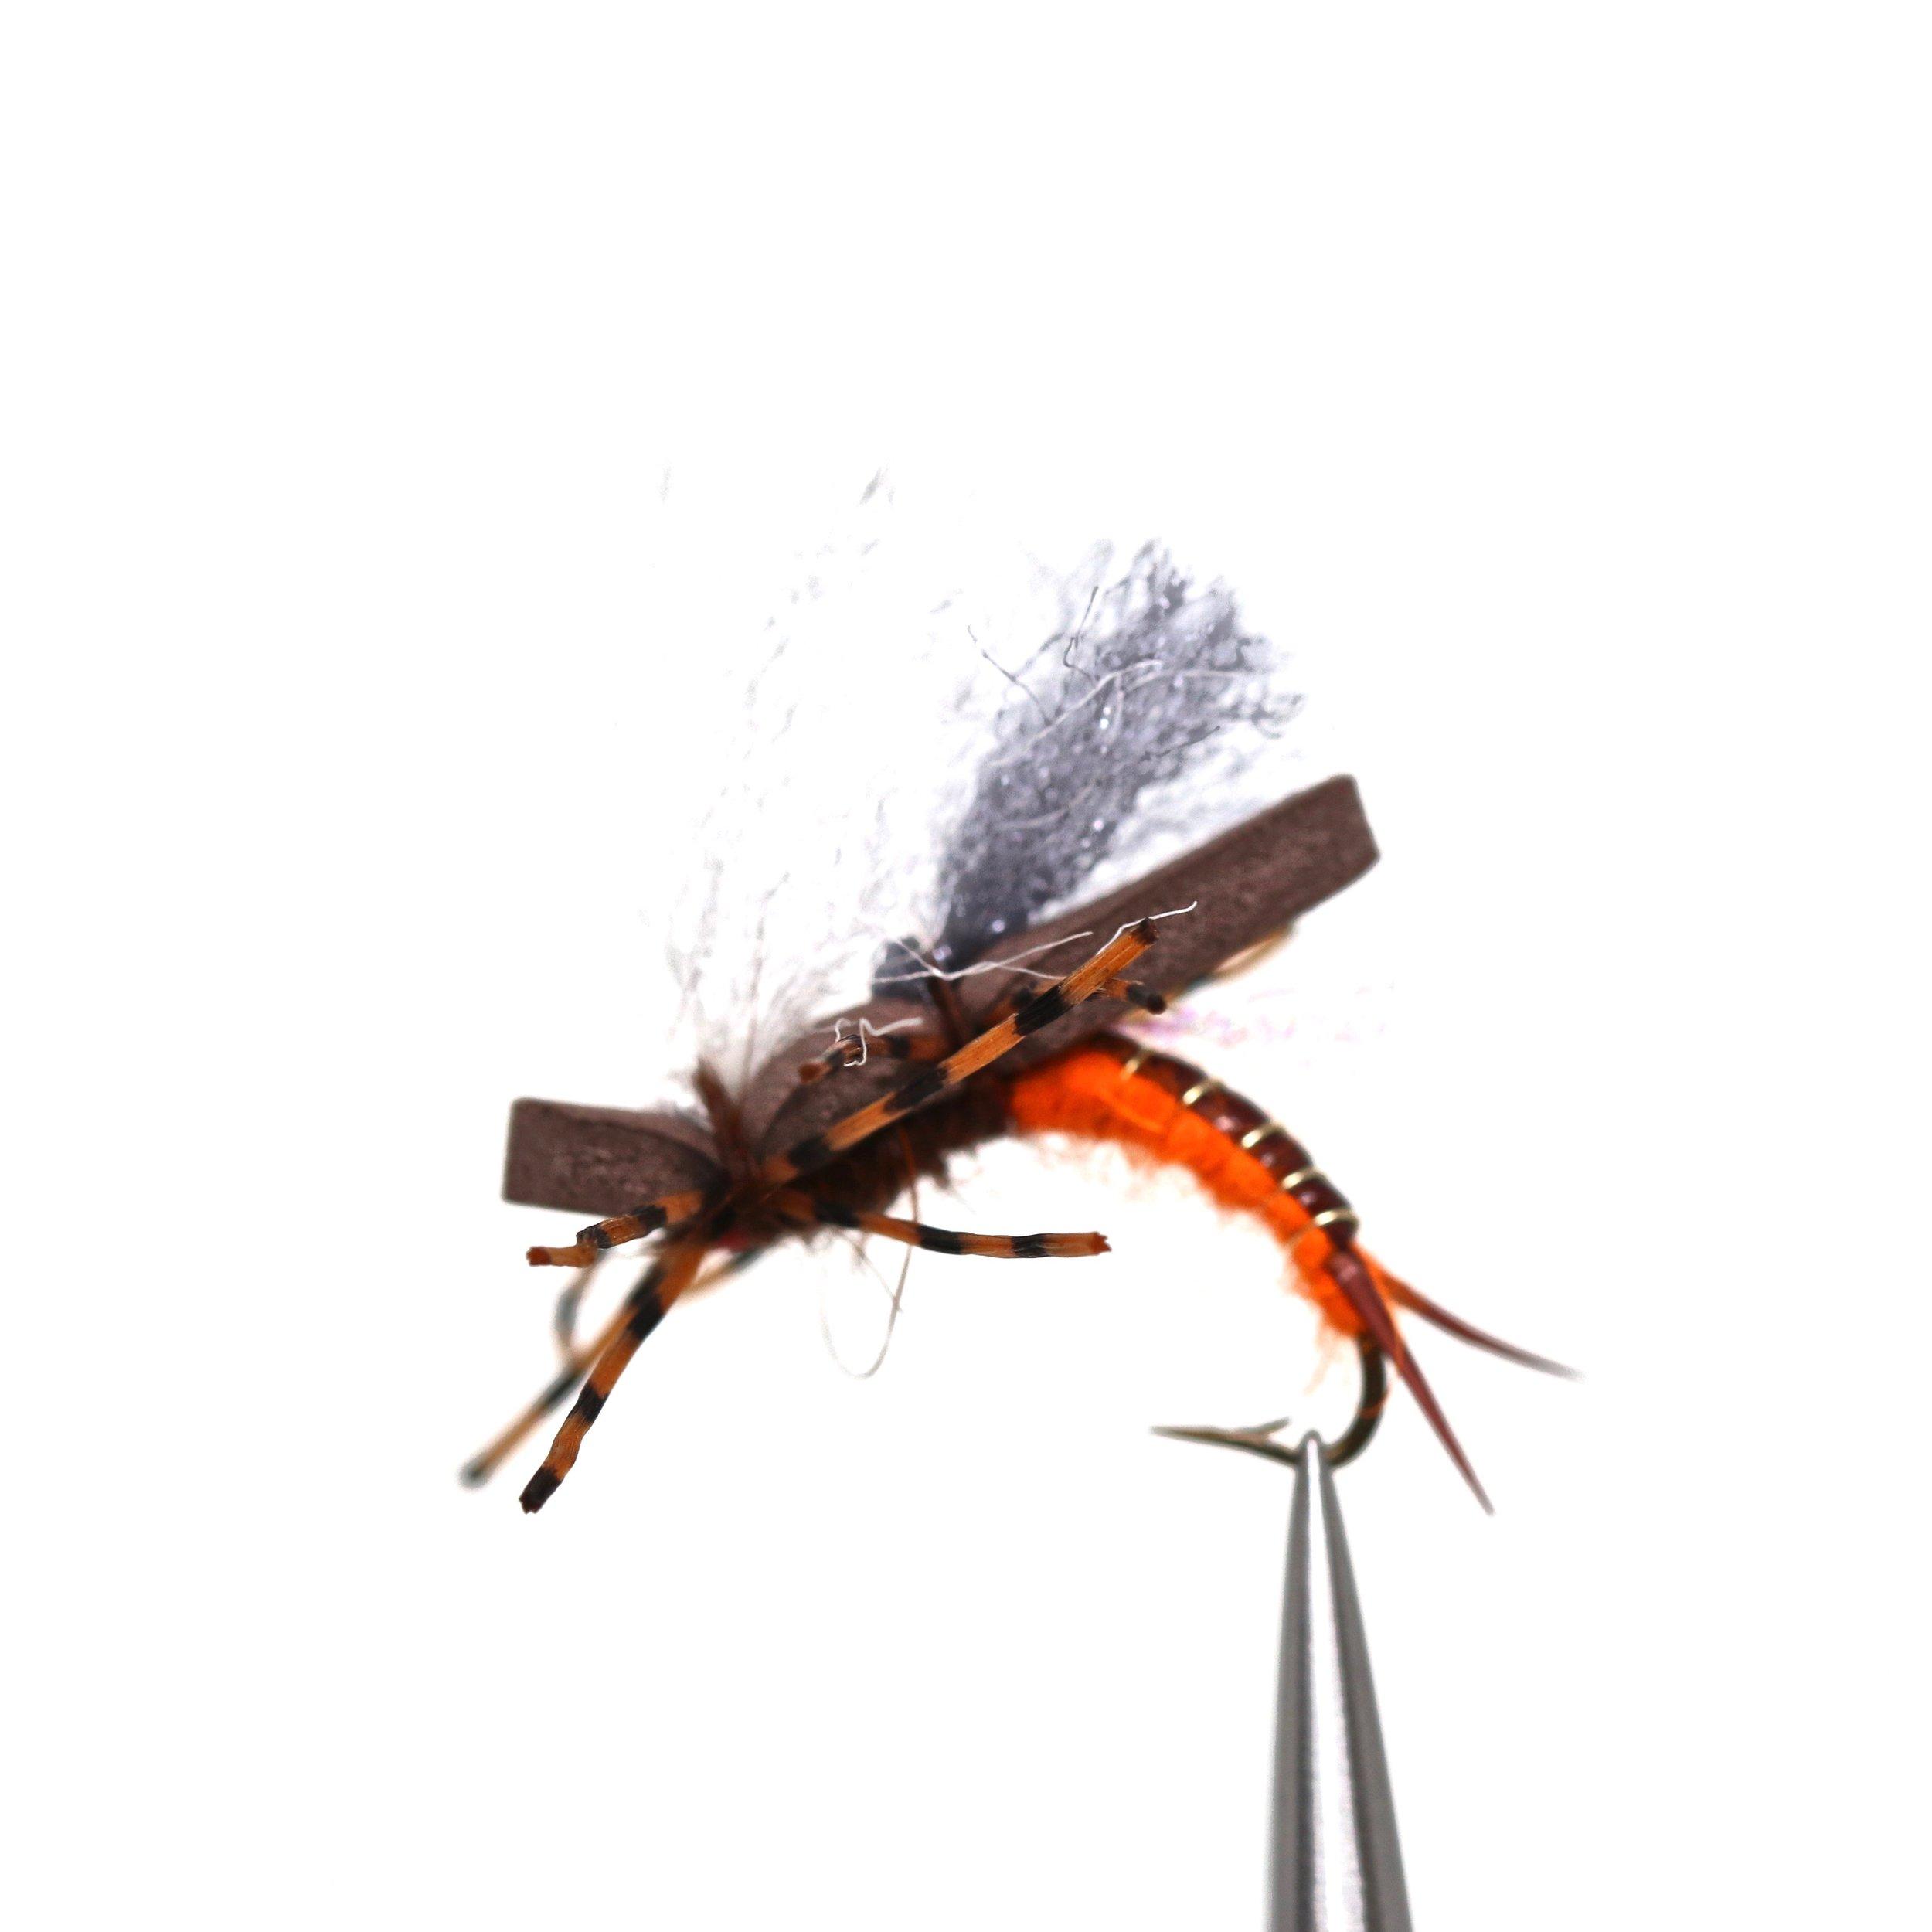 Saligas Low Rider Salmon Fly:  https://ironbowflyshop.ca/products/saligas-low-rider-salmonfly